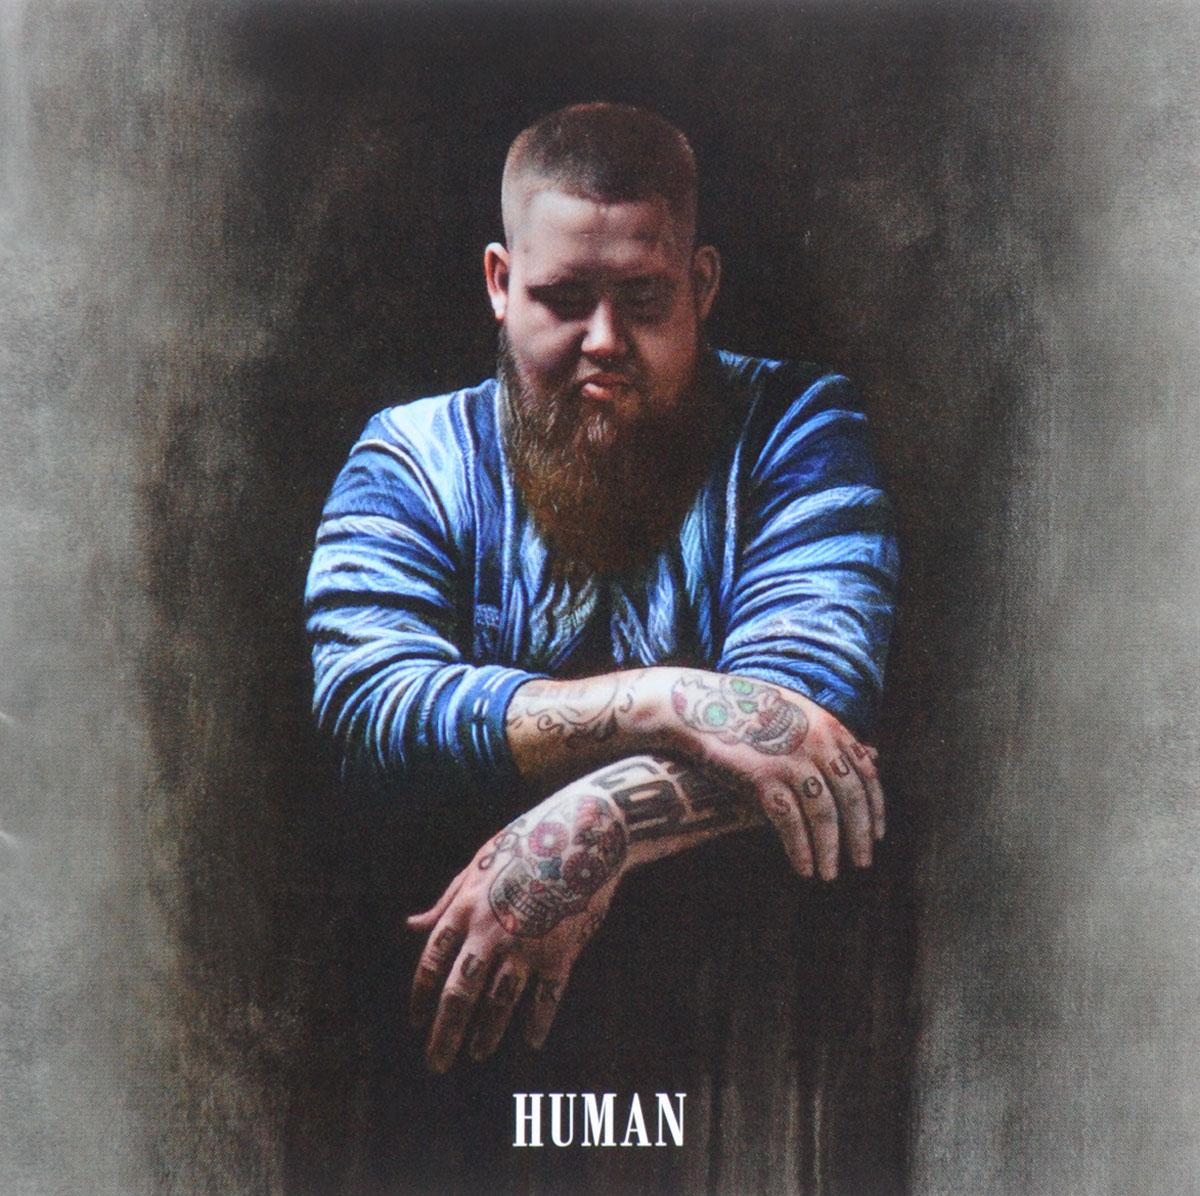 Human Human. Rag'n'bone Man (2 LP)